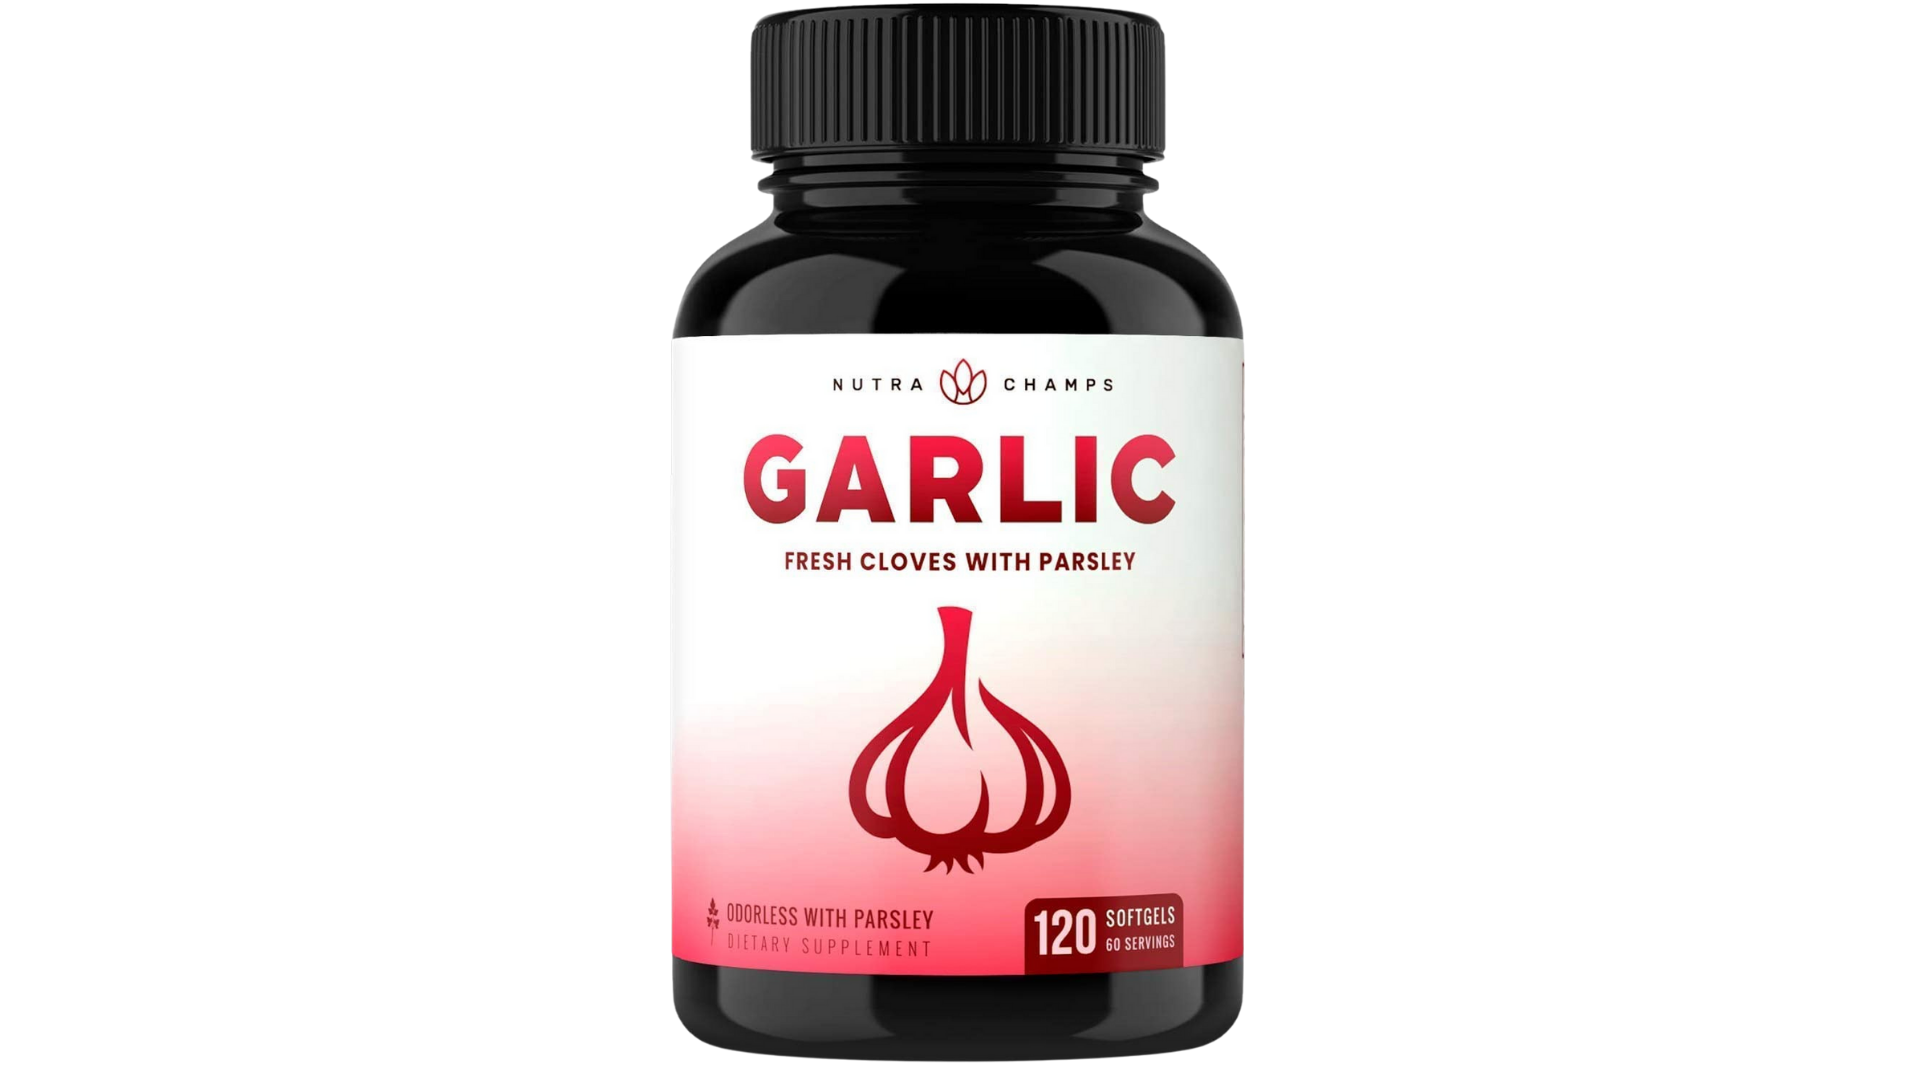 NutraChamps best garlic pills for high blood pressure